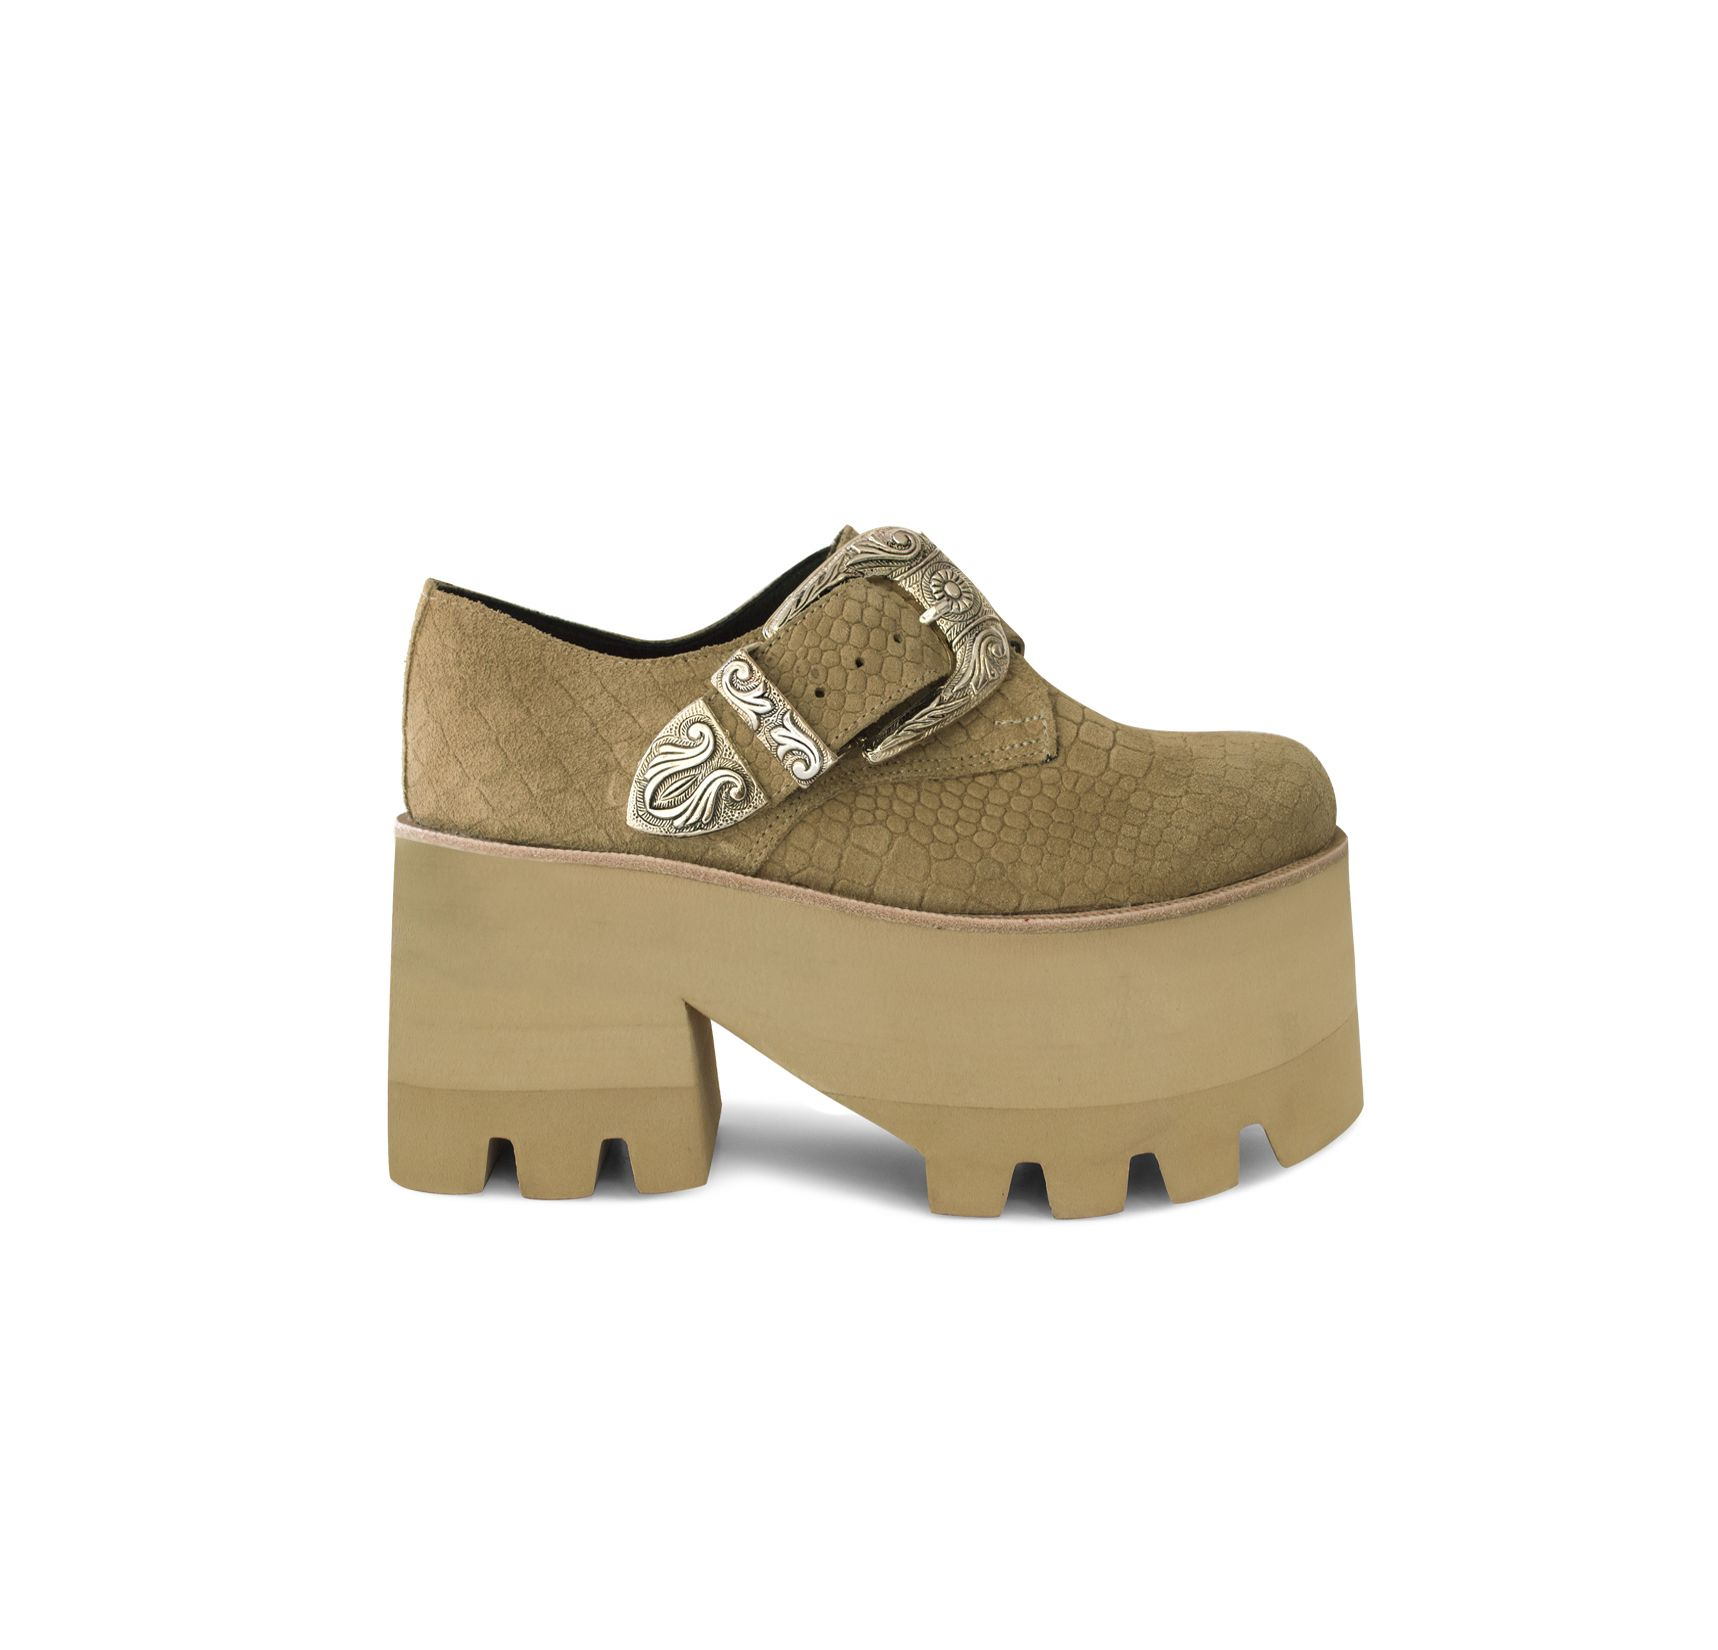 728286b5 TAILANDIA GAMUZA CROCO | SHOES en 2019 | Shoes, Fashion shoes y Fashion